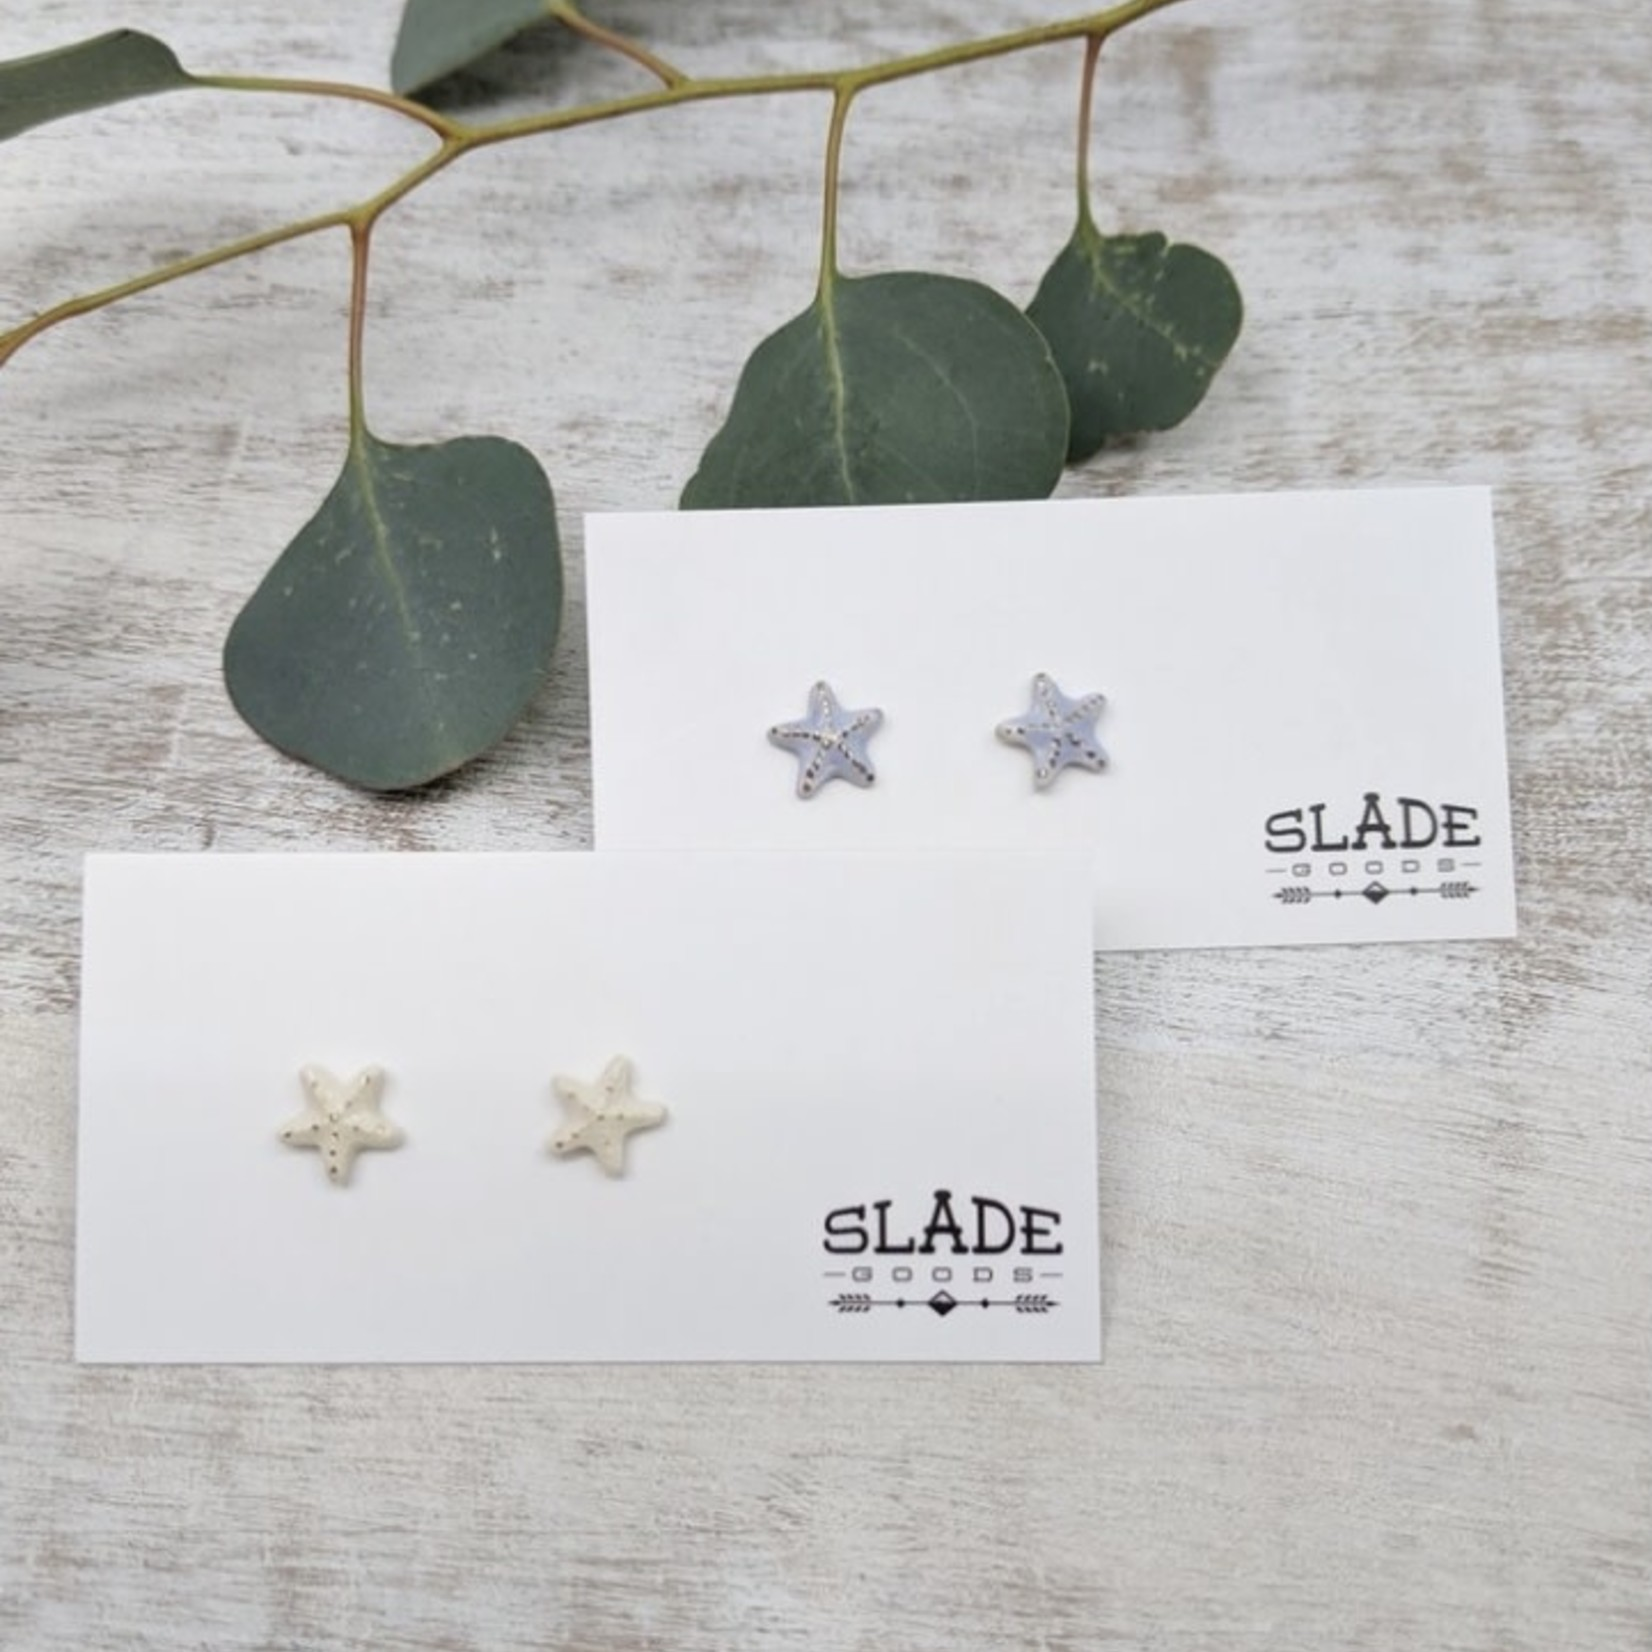 Slade Goods Starfish Stud Earrings